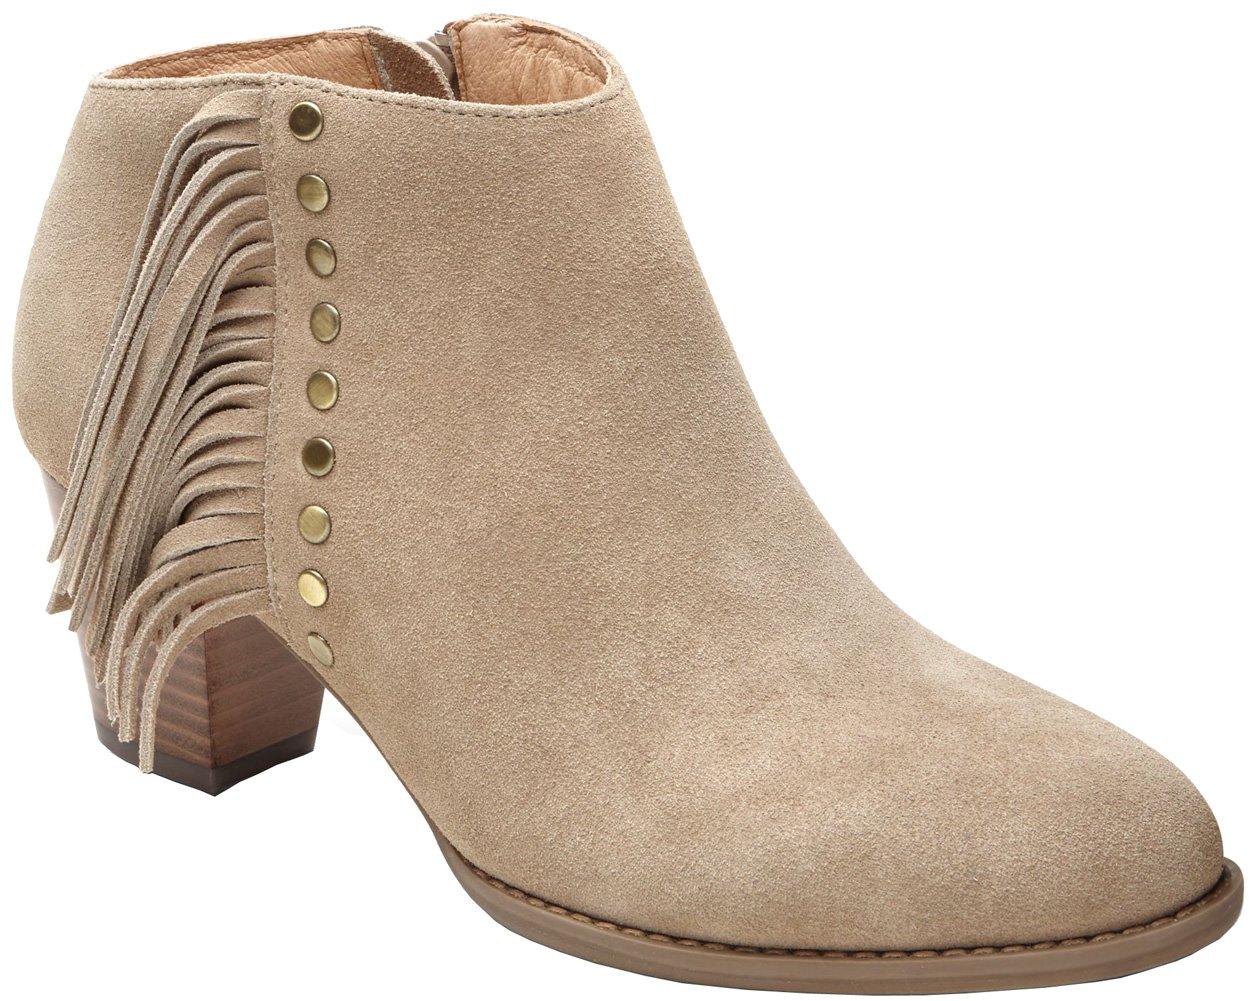 Vionic Women's Upright Faros Fringe Ankle Boot (LightTan, 7 W)